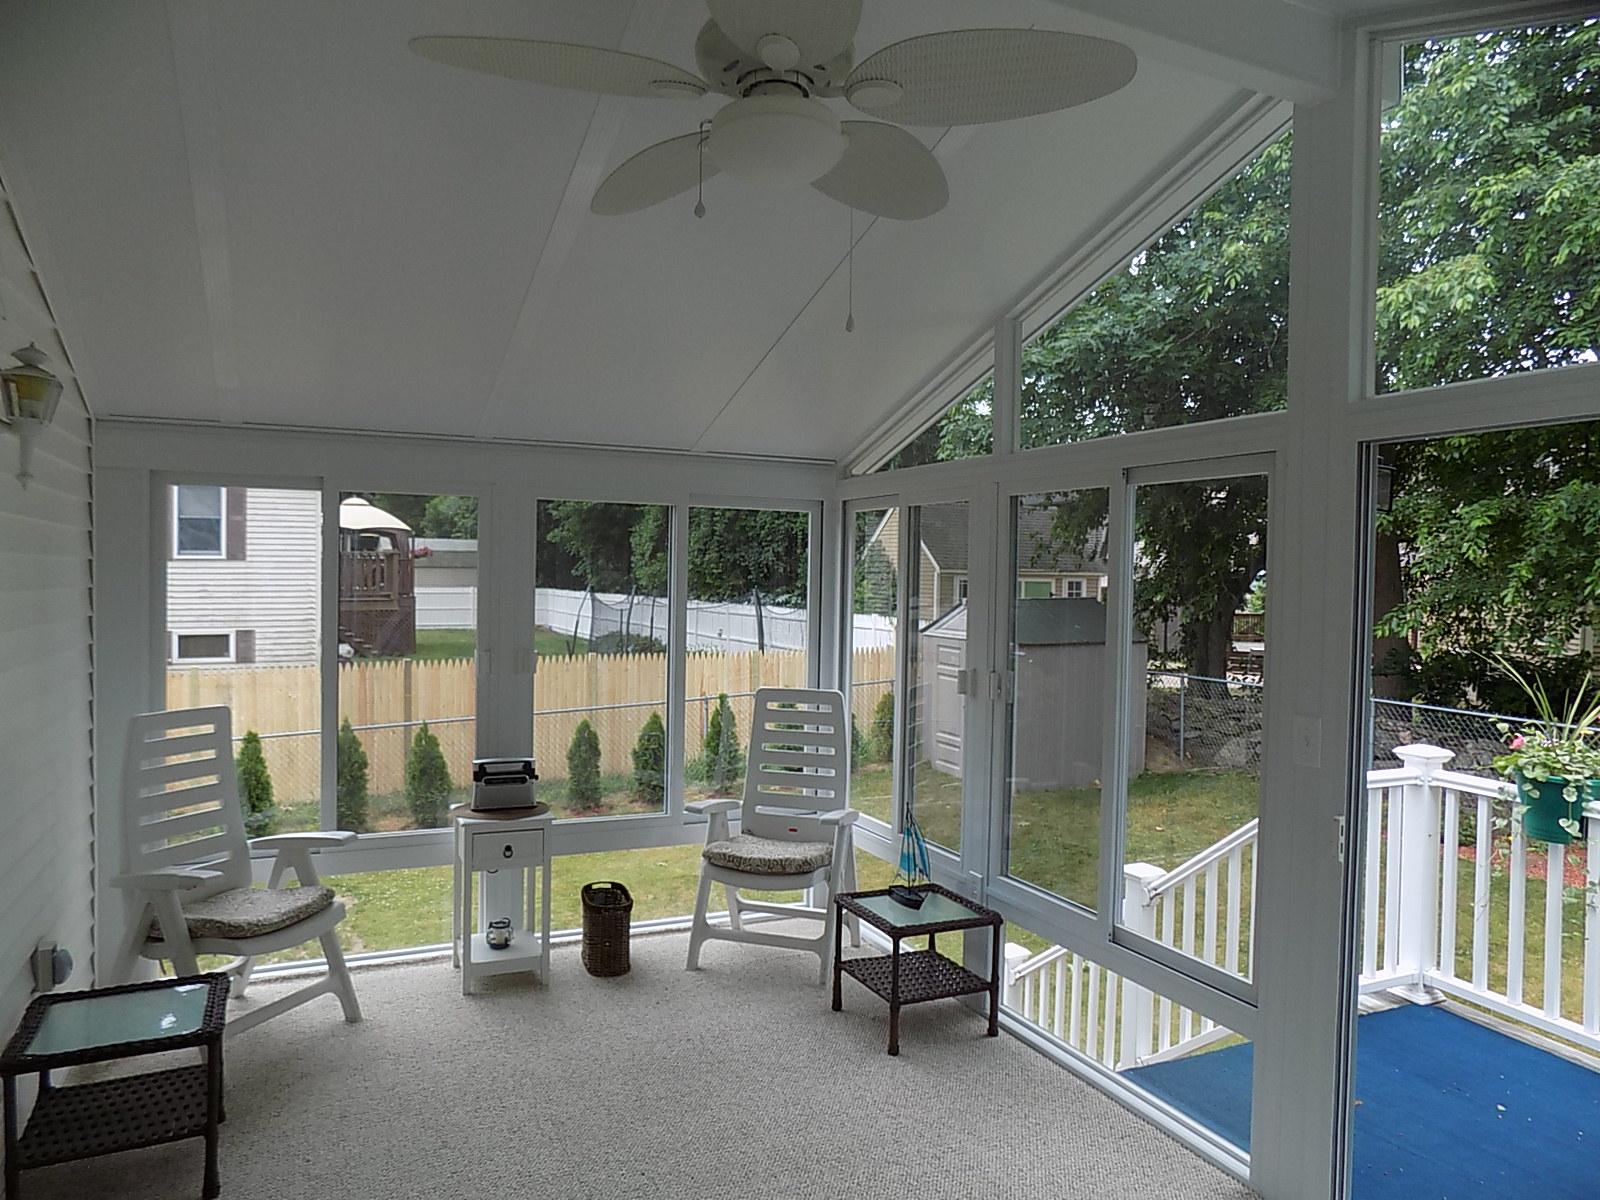 A-frame, 3-season sunroom, Betterliving Sunrooms of New Hampshire